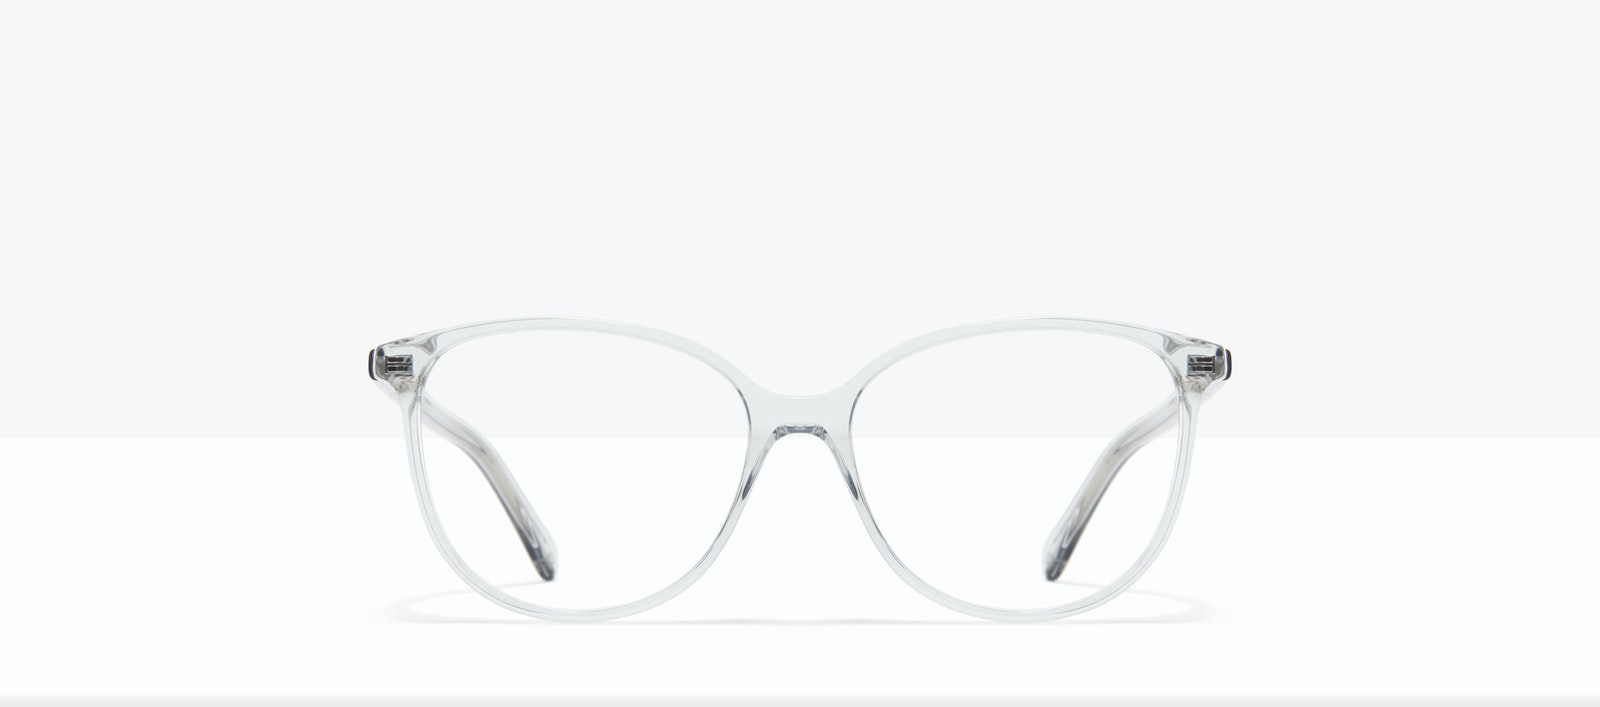 Affordable Fashion Glasses Cat Eye Eyeglasses Women Imagine XS Taupe Front